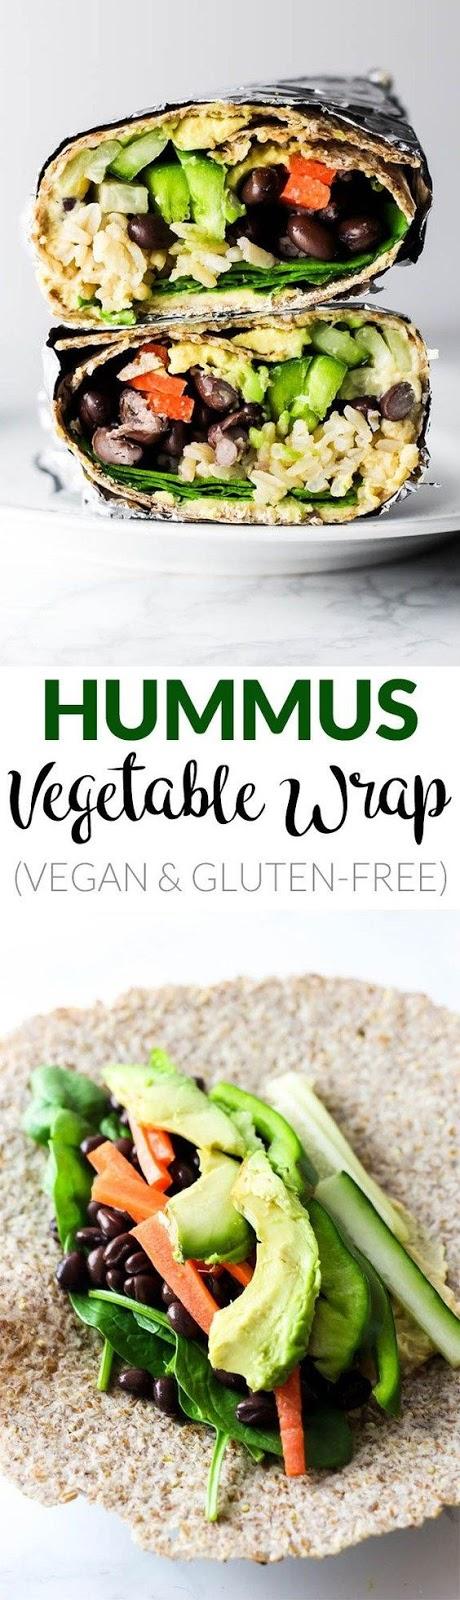 Hummus Vegetable Wrap